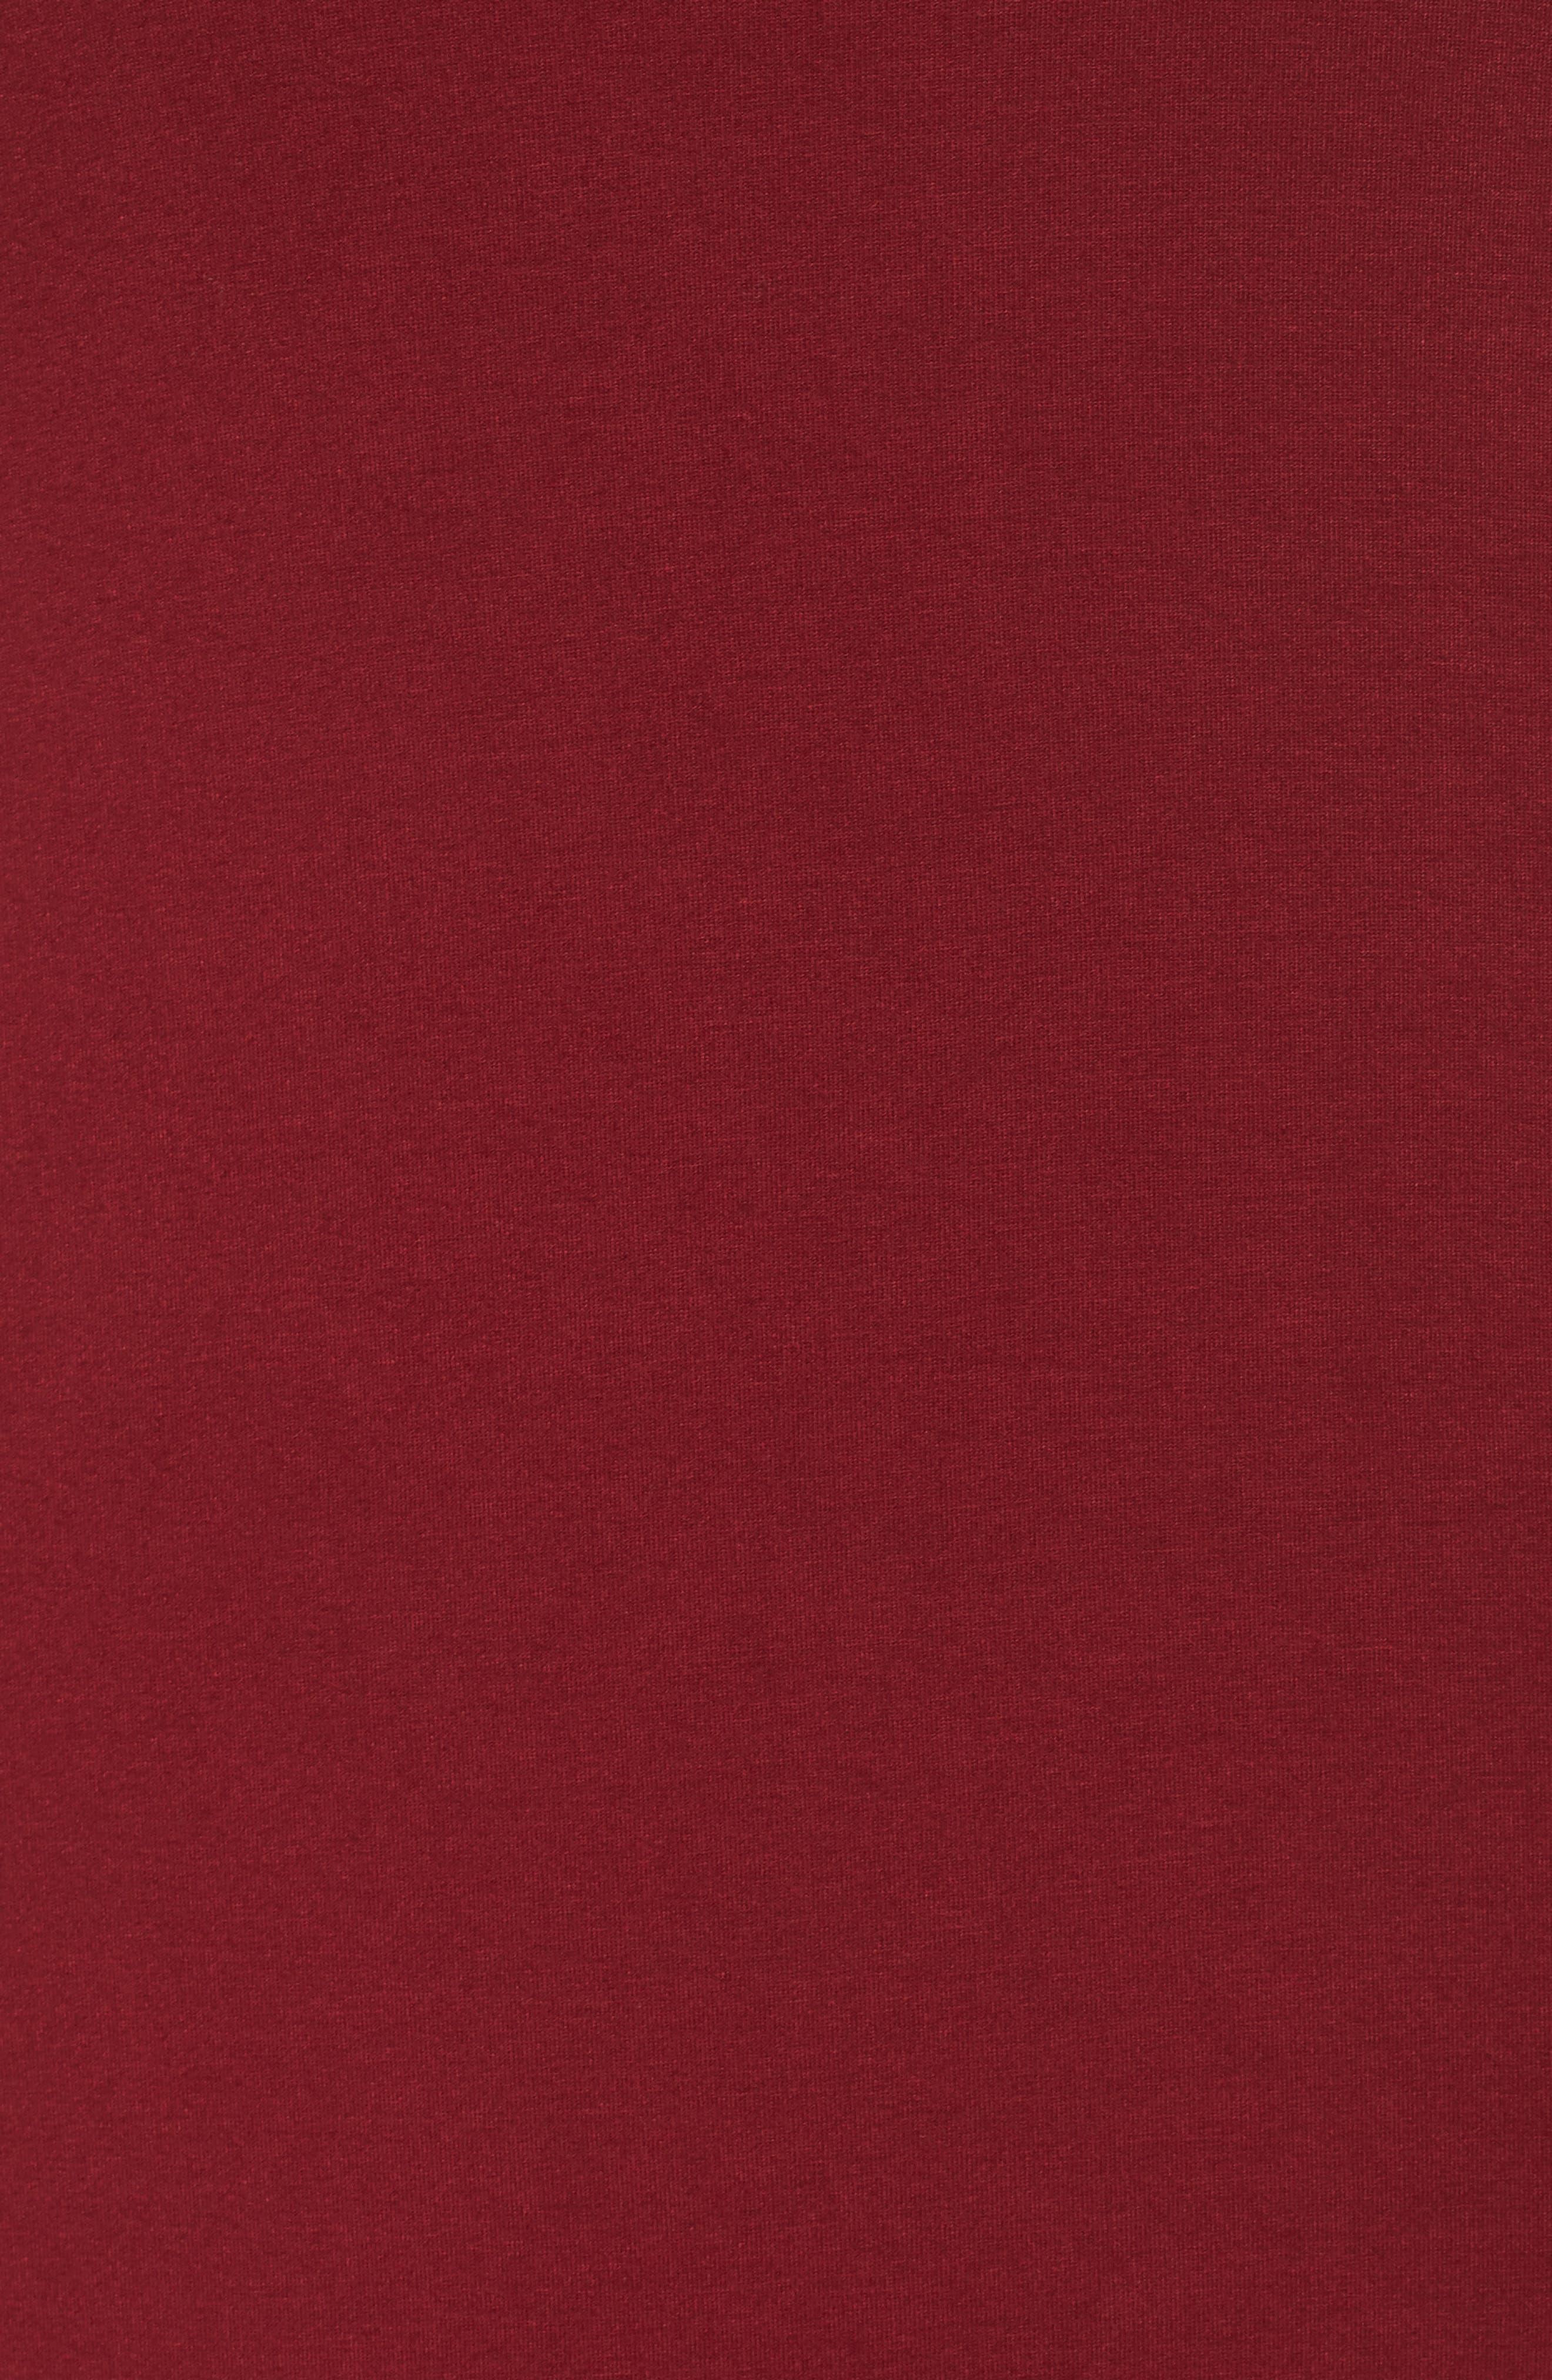 Tie Strap Knit Maxi Dress,                             Alternate thumbnail 6, color,                             Wine